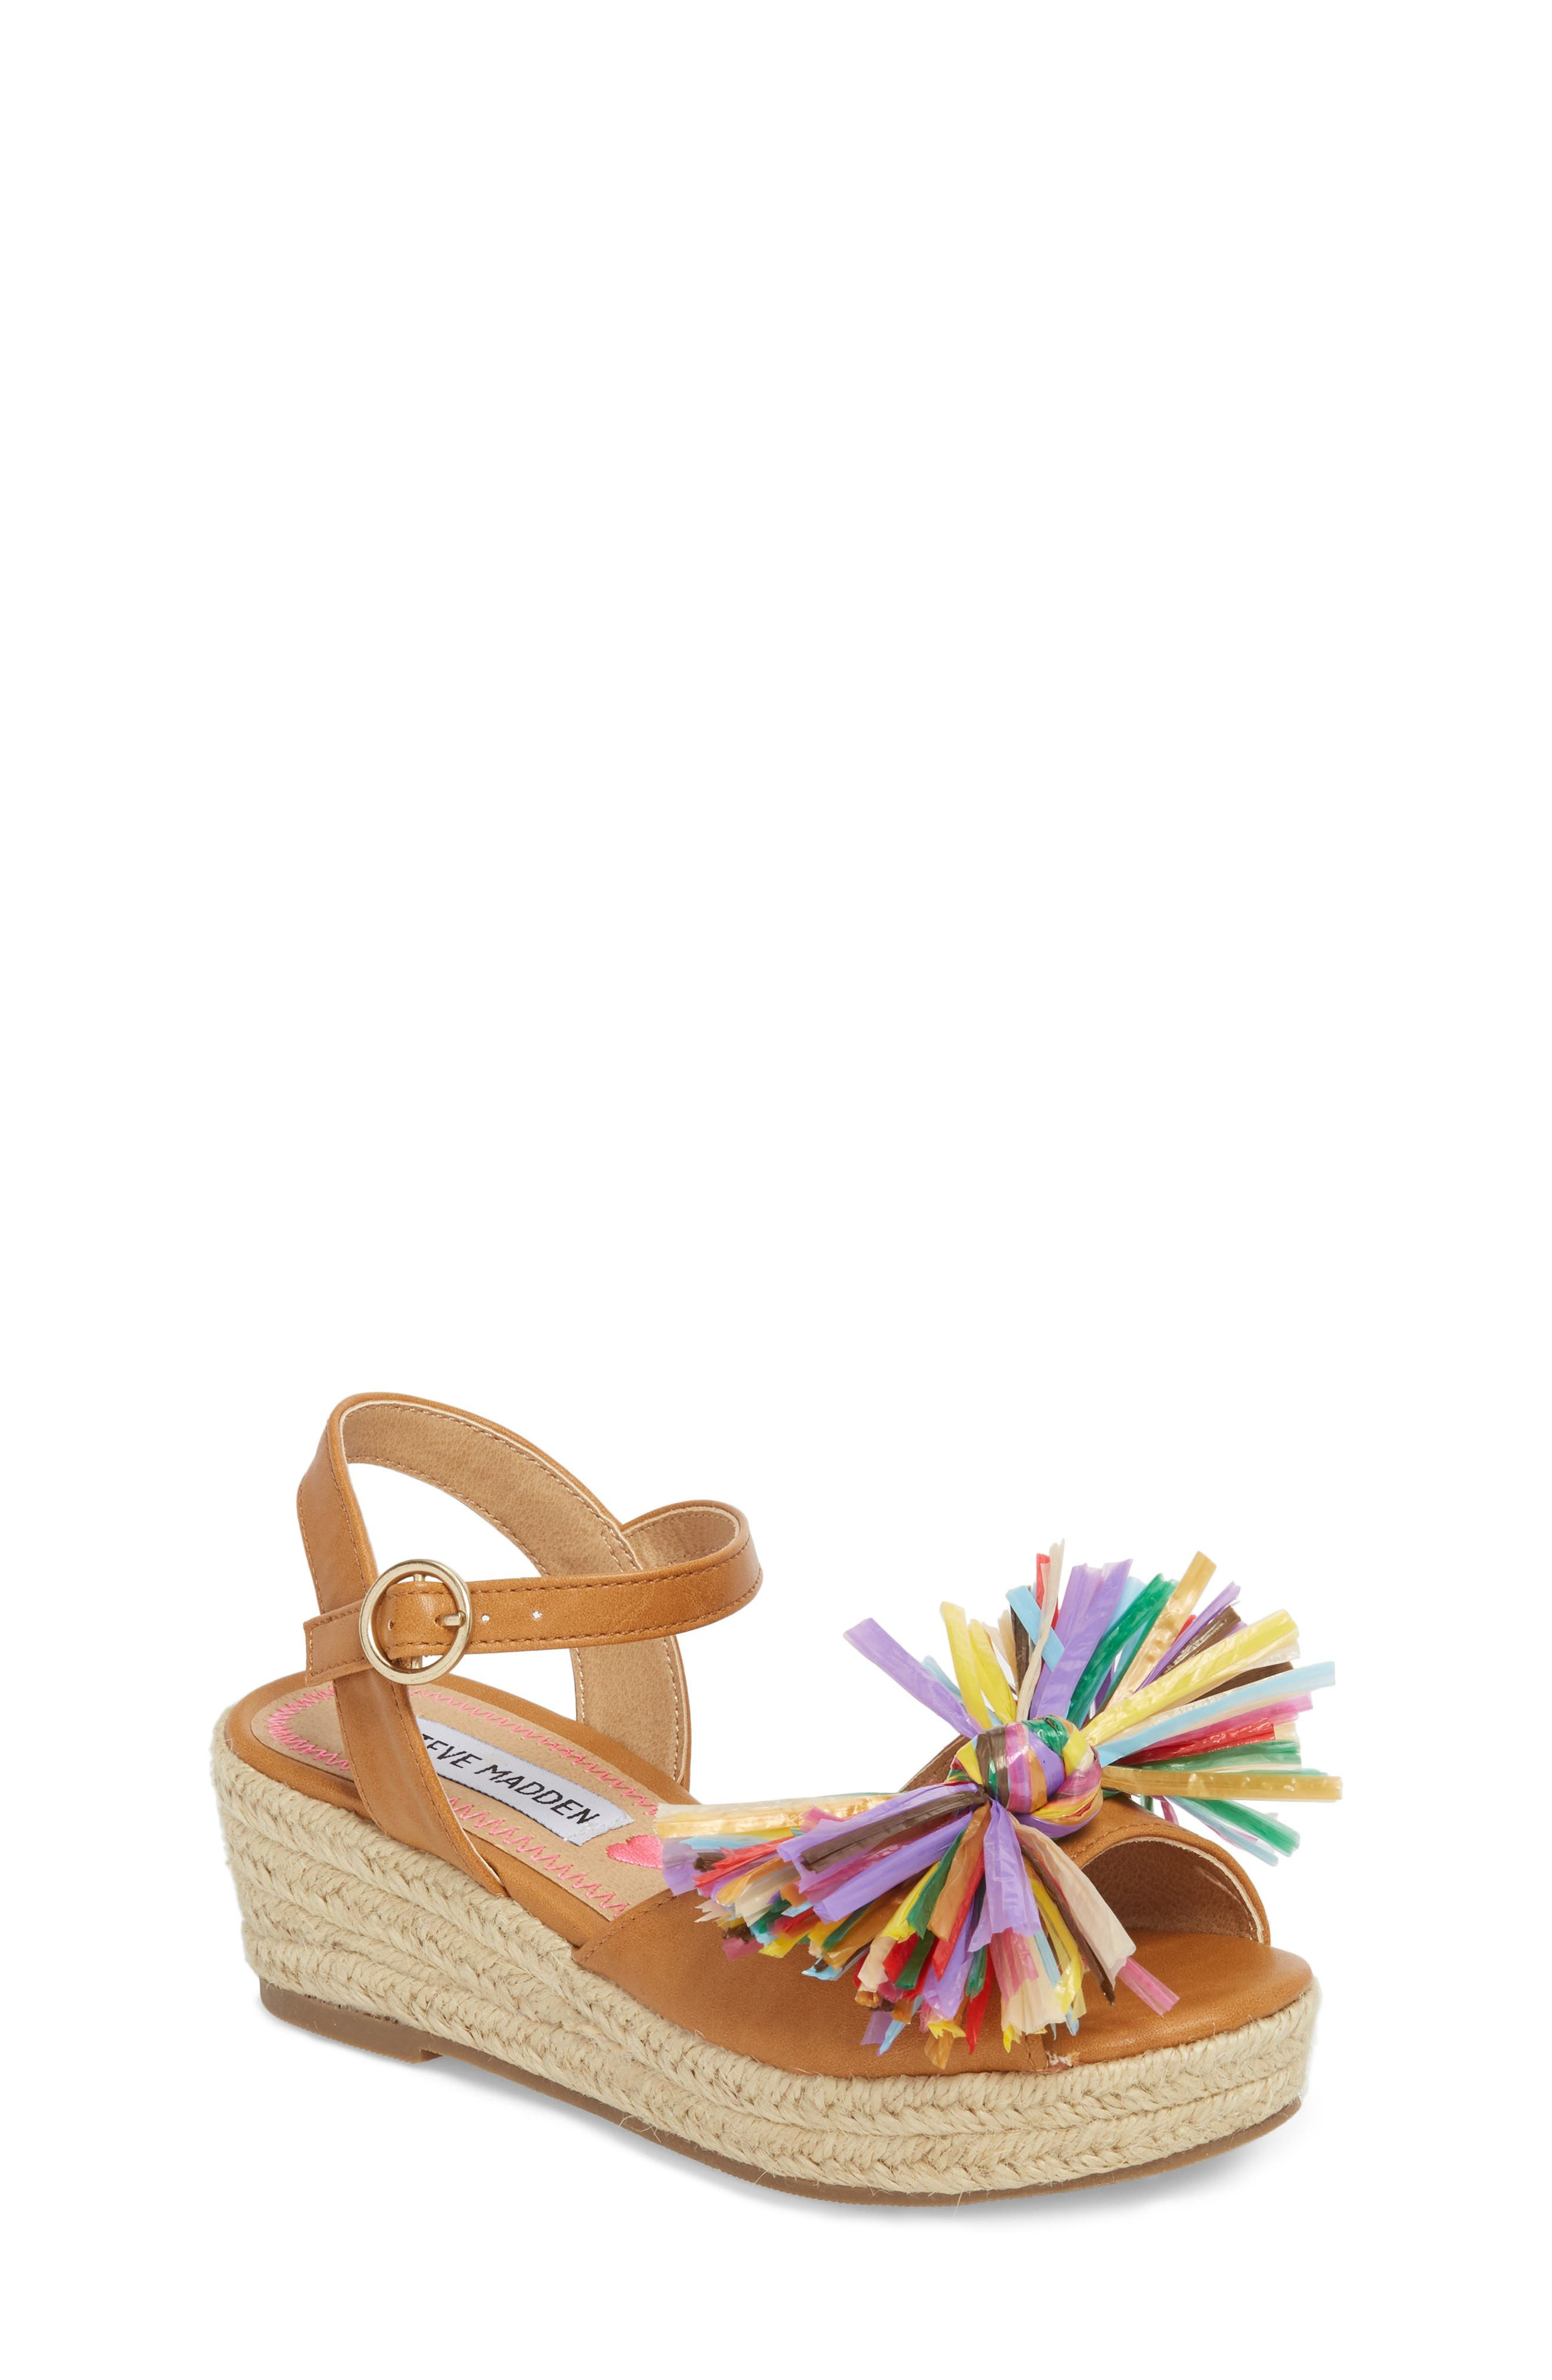 JSTRWBERI Wedge Sandal,                         Main,                         color, Cognac Multi